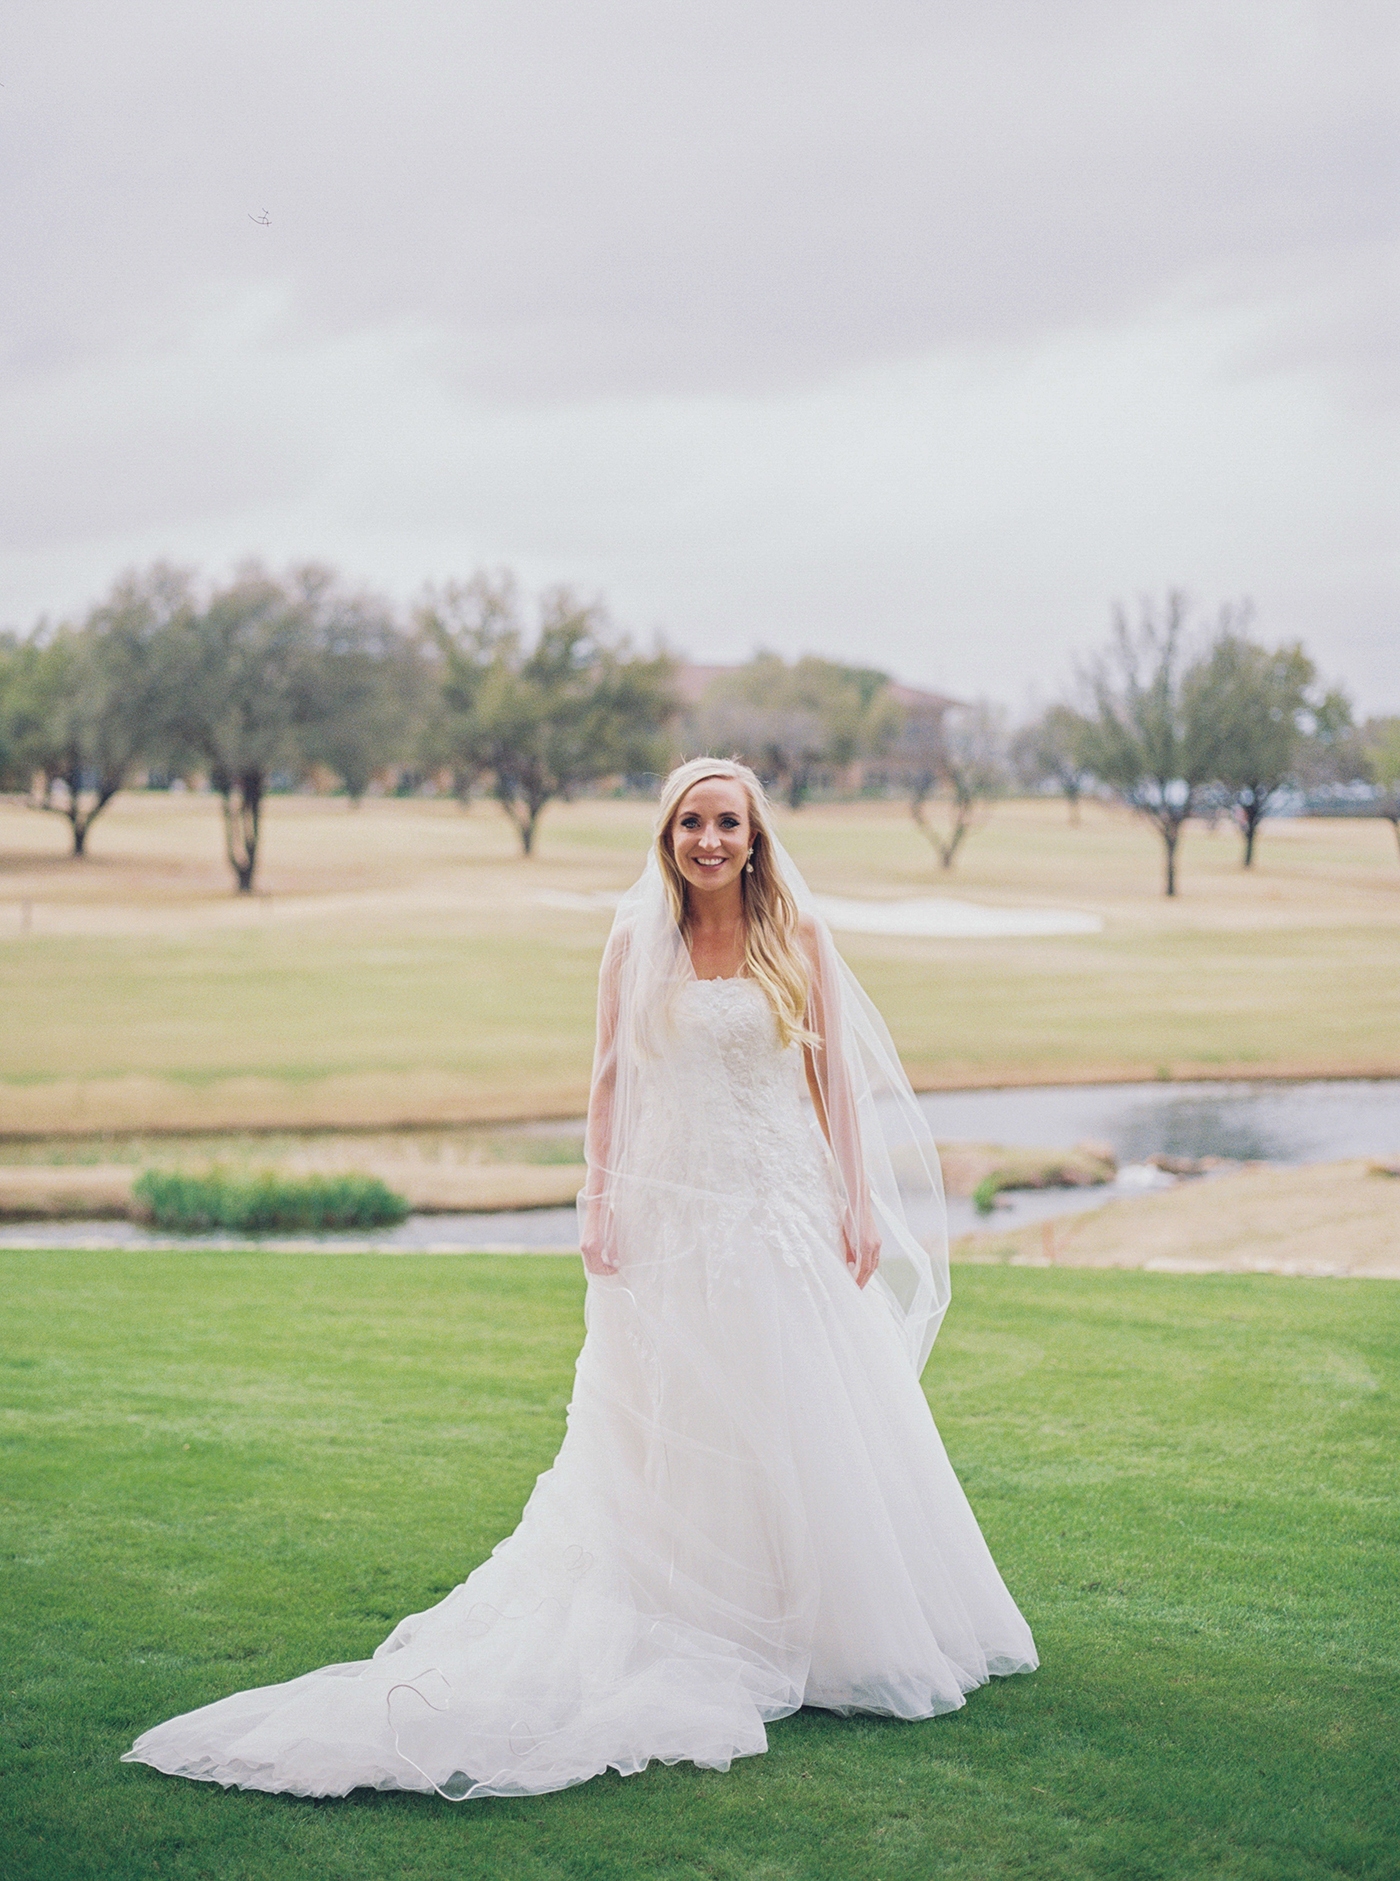 DFW Wedding Planner - Caroline + Jeff at The Four Seasons Hotel Wedding - Allday Events - 29.jpg